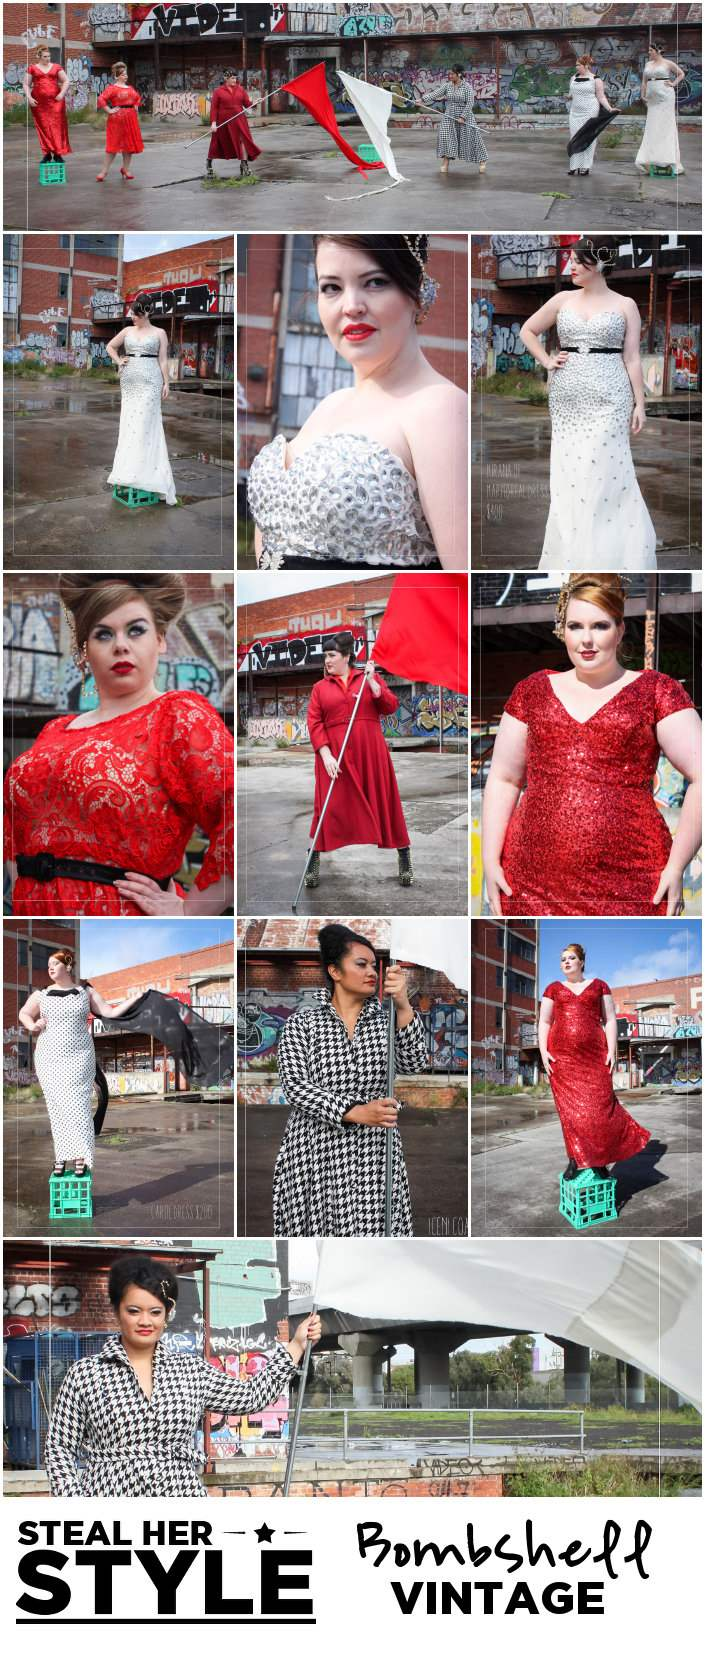 Where to Buy Plus-Size Fashion Bombshell Vintage